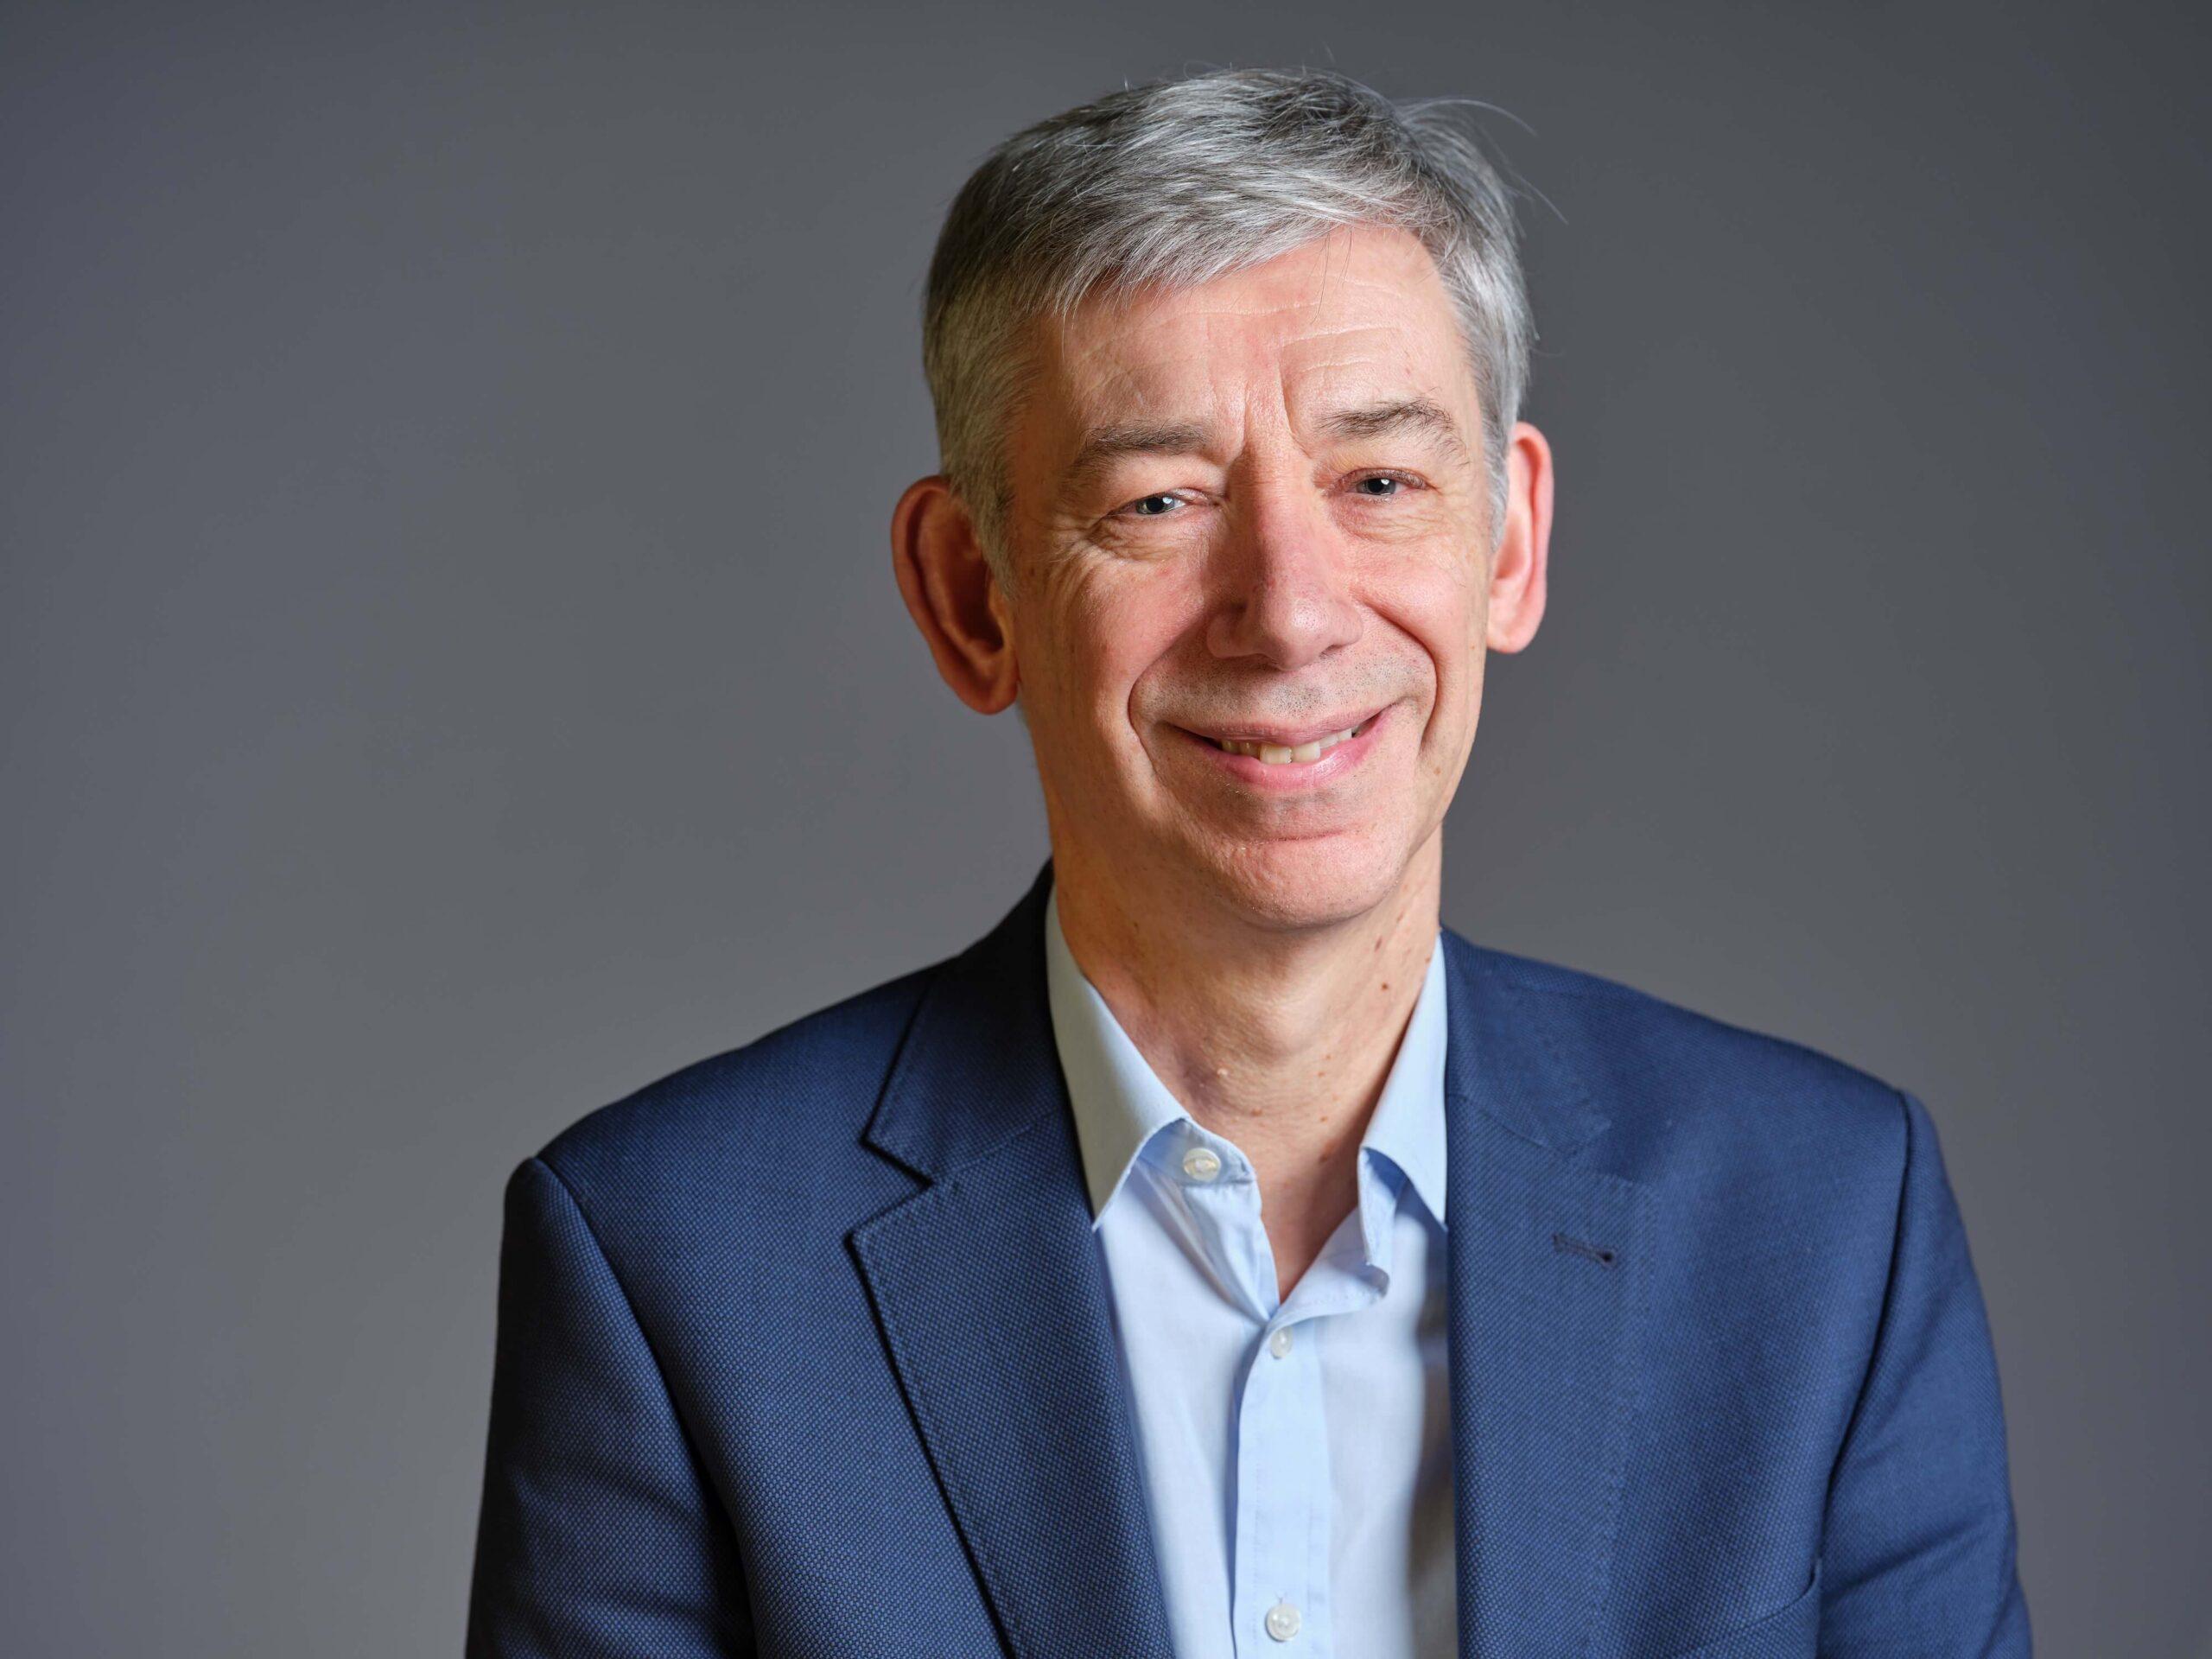 Career advice and inspiration: Michael Eakin, Chief Executive, Royal Liverpool Philharmonic